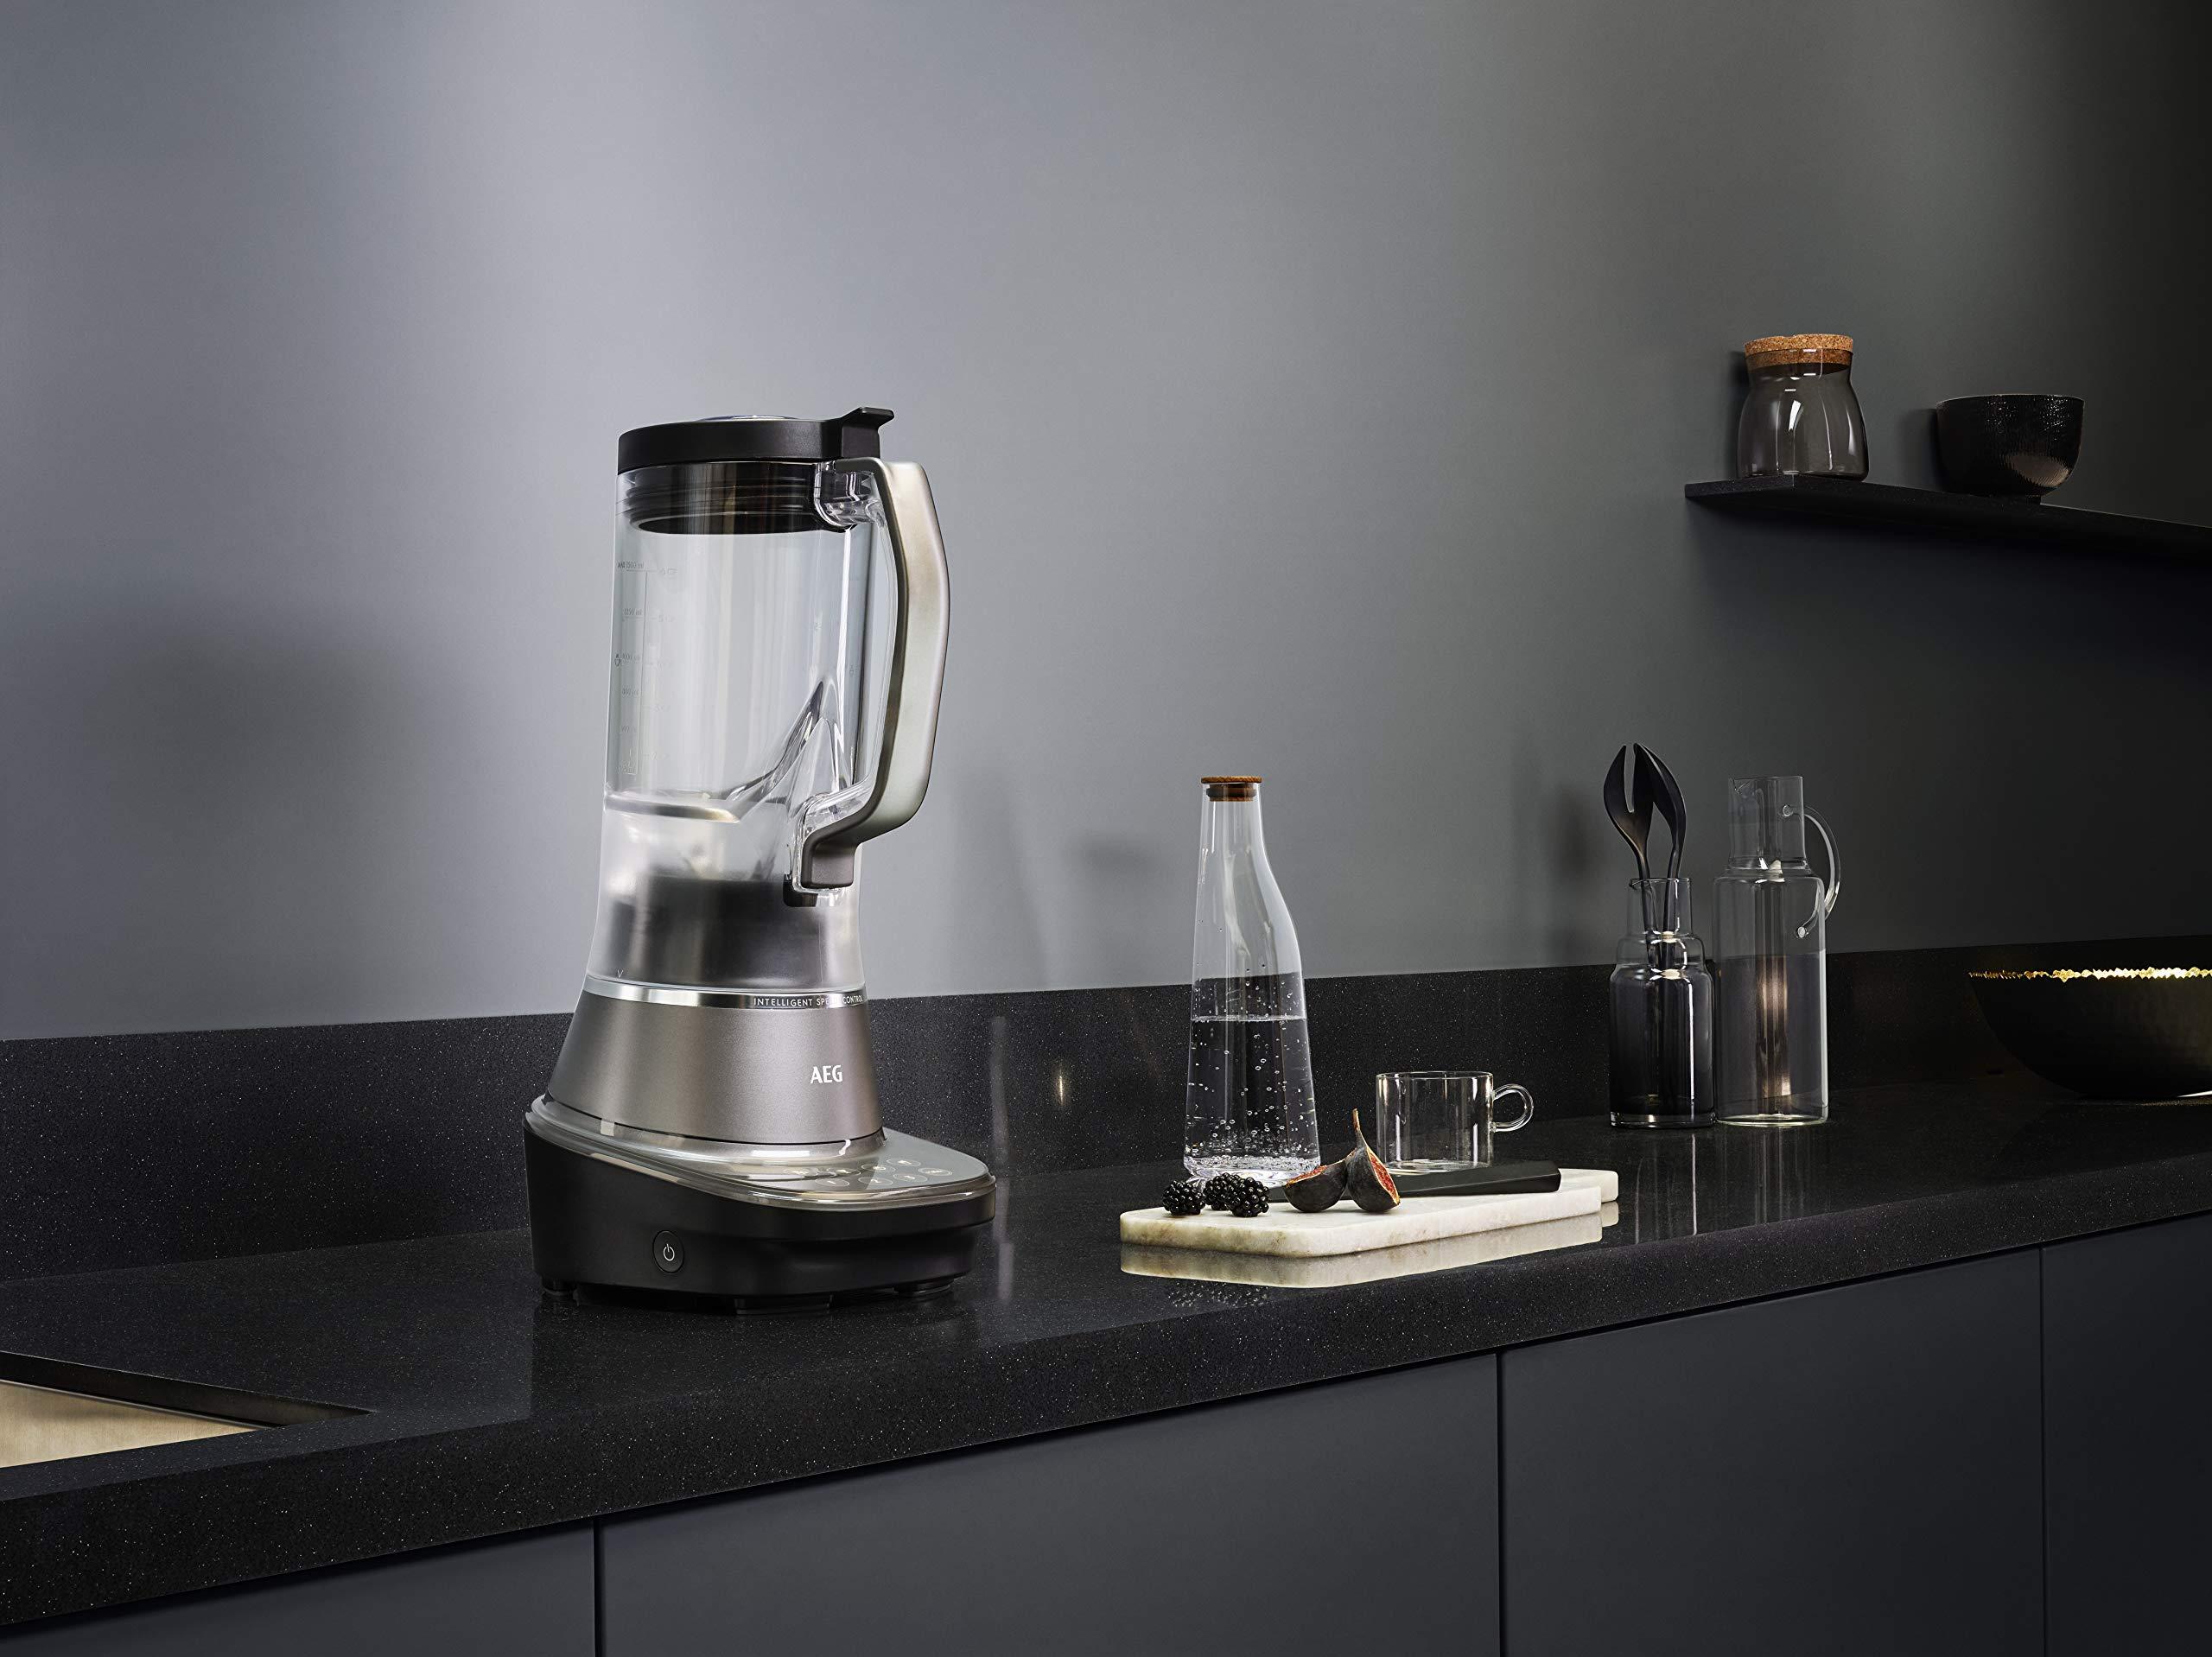 AEG-Gourmet-7-Mixer-TB7-1-8MTM-Standmixer-12-PS-3-Stufen-plus-4-Rezeptprogramme-15-l-Tritan-Krug-6-Klingen-Edelstahlmesser-Touch-Display-LED-Hinterleuchtung-BPA-frei-grauschwarz